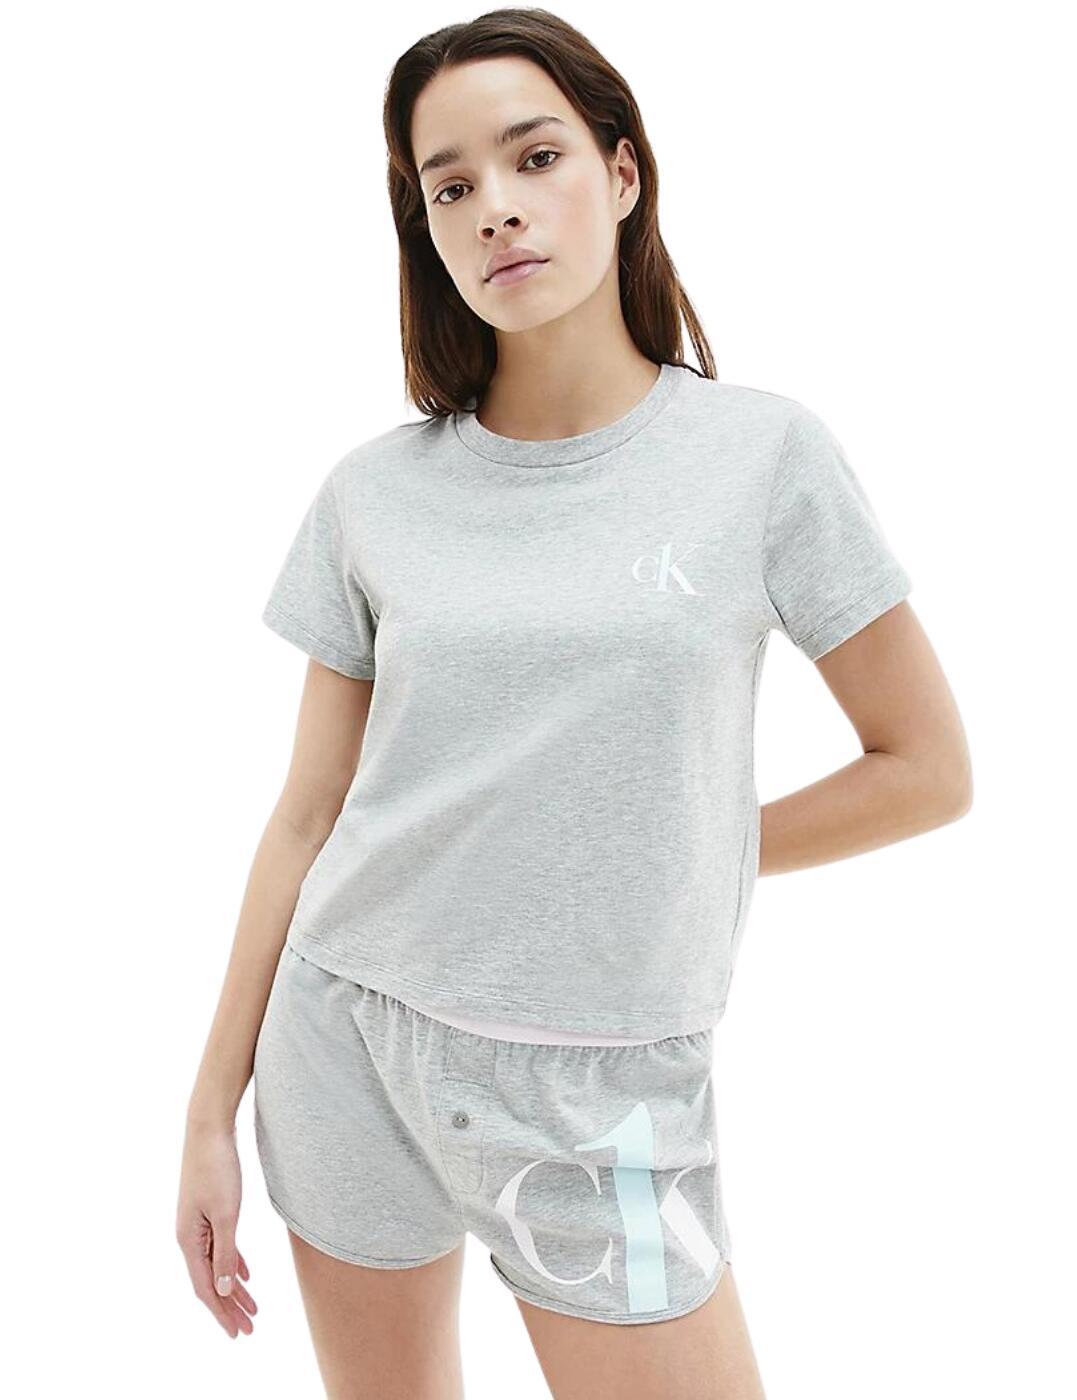 Calvin Klein CK One Shorts Pyjama Set Grey Heather/Pearly Pink